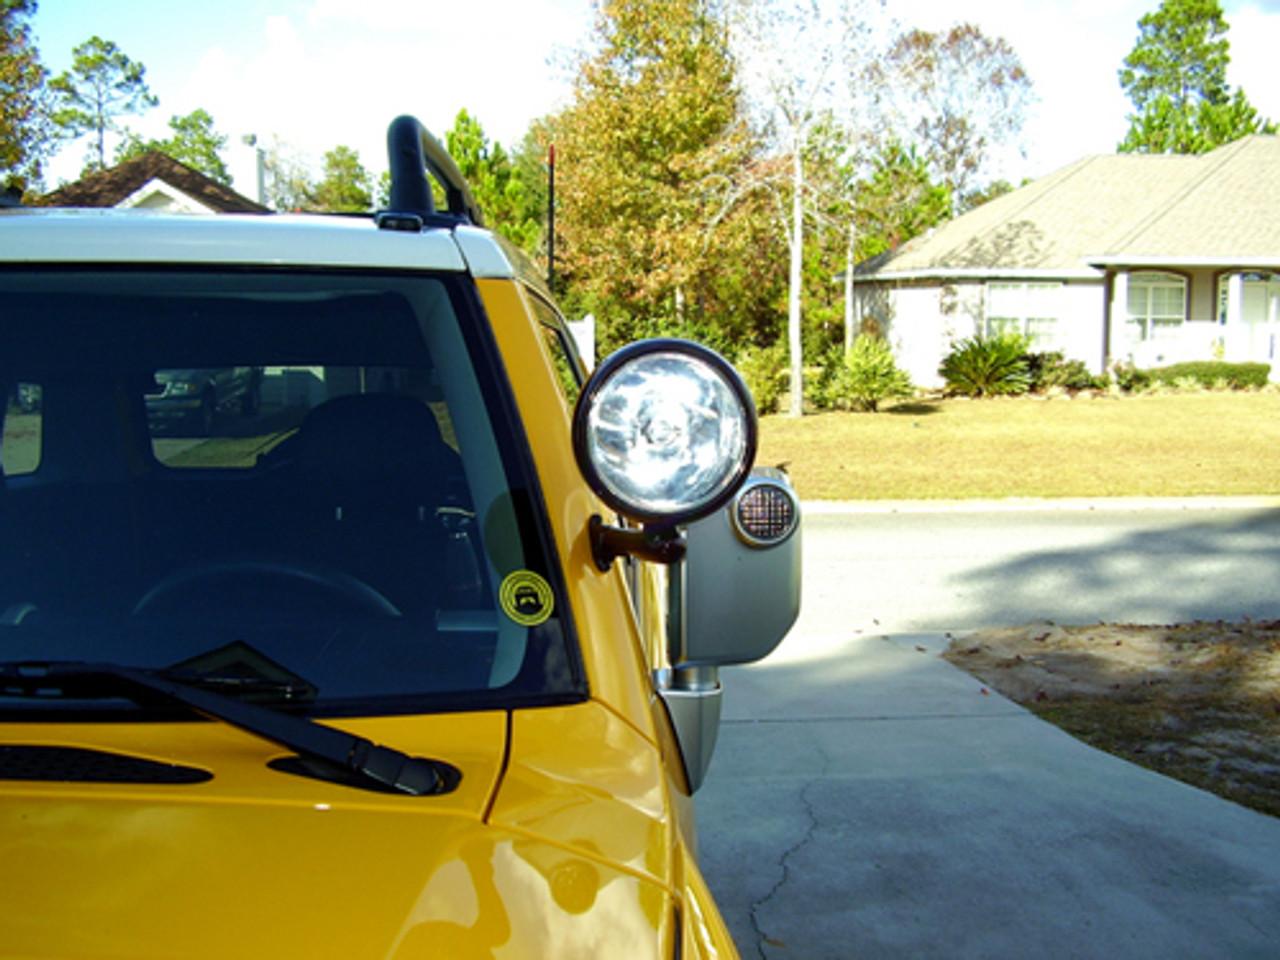 2012 Dodge trucks DURANGO Post mount spotlight -Black 6 inch Driver side WITH install kit 100W Halogen